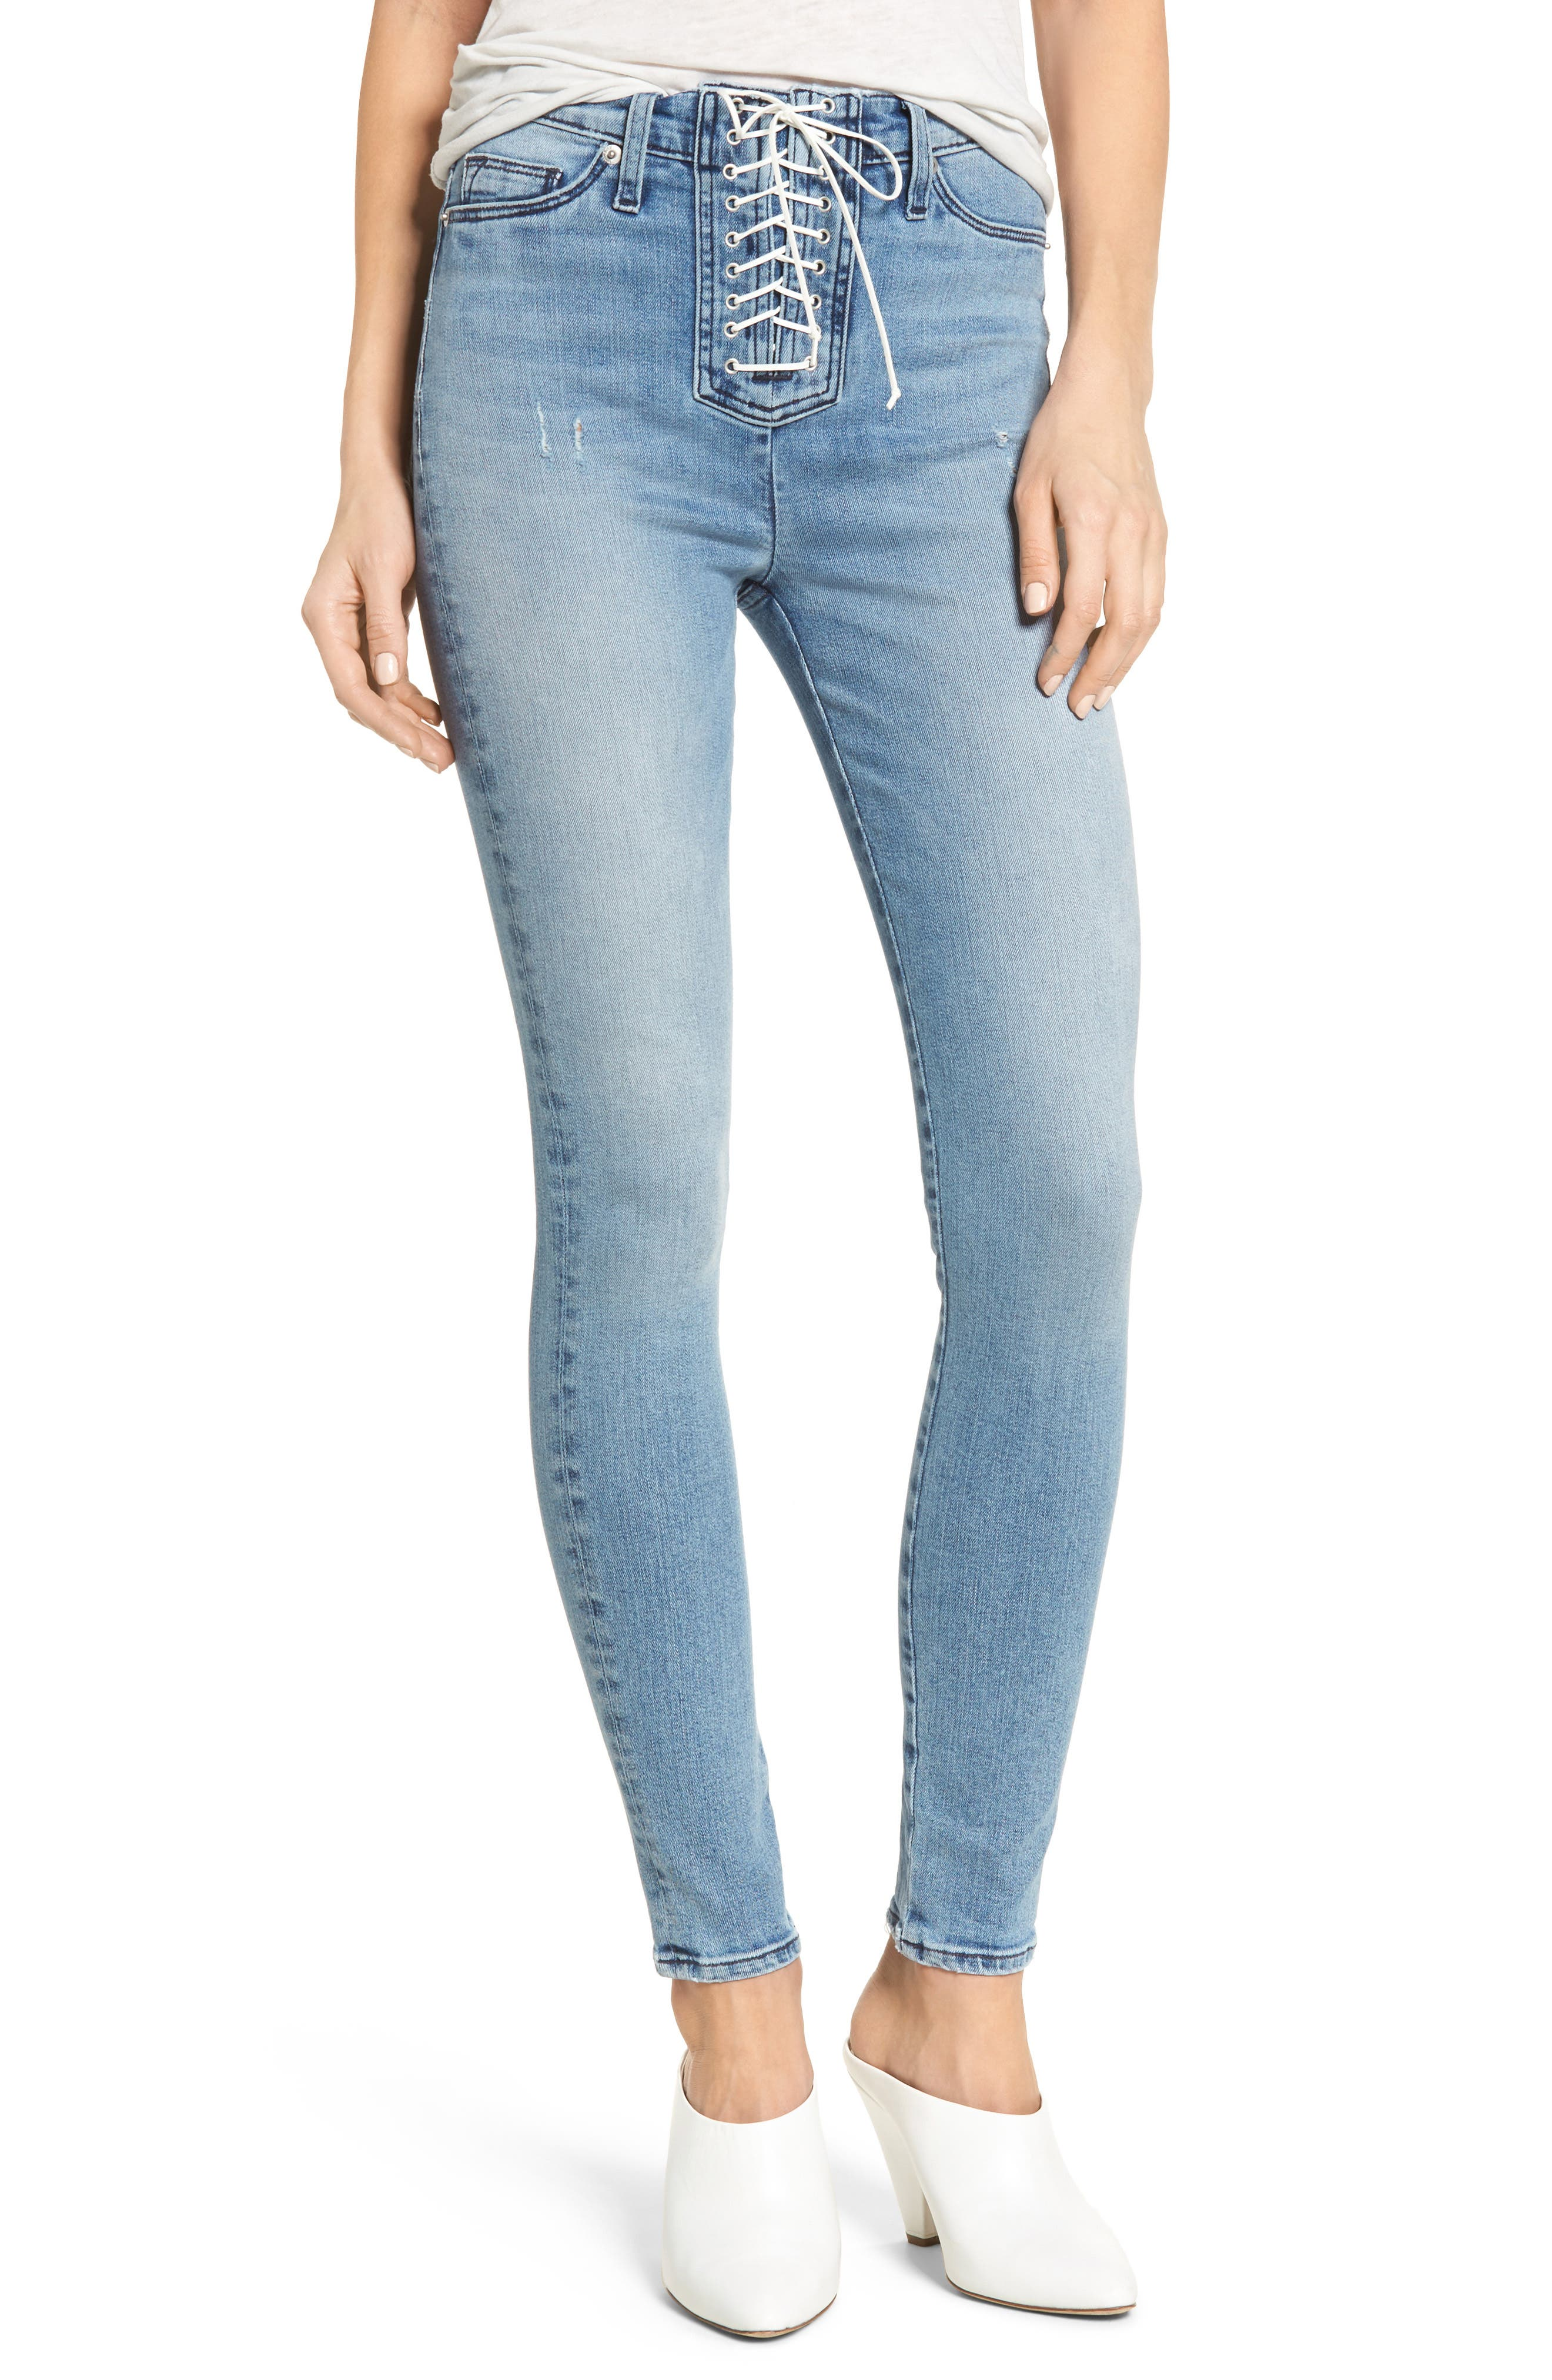 Bullocks Lace-Up High Waist Super Skinny Jeans,                             Main thumbnail 2, color,